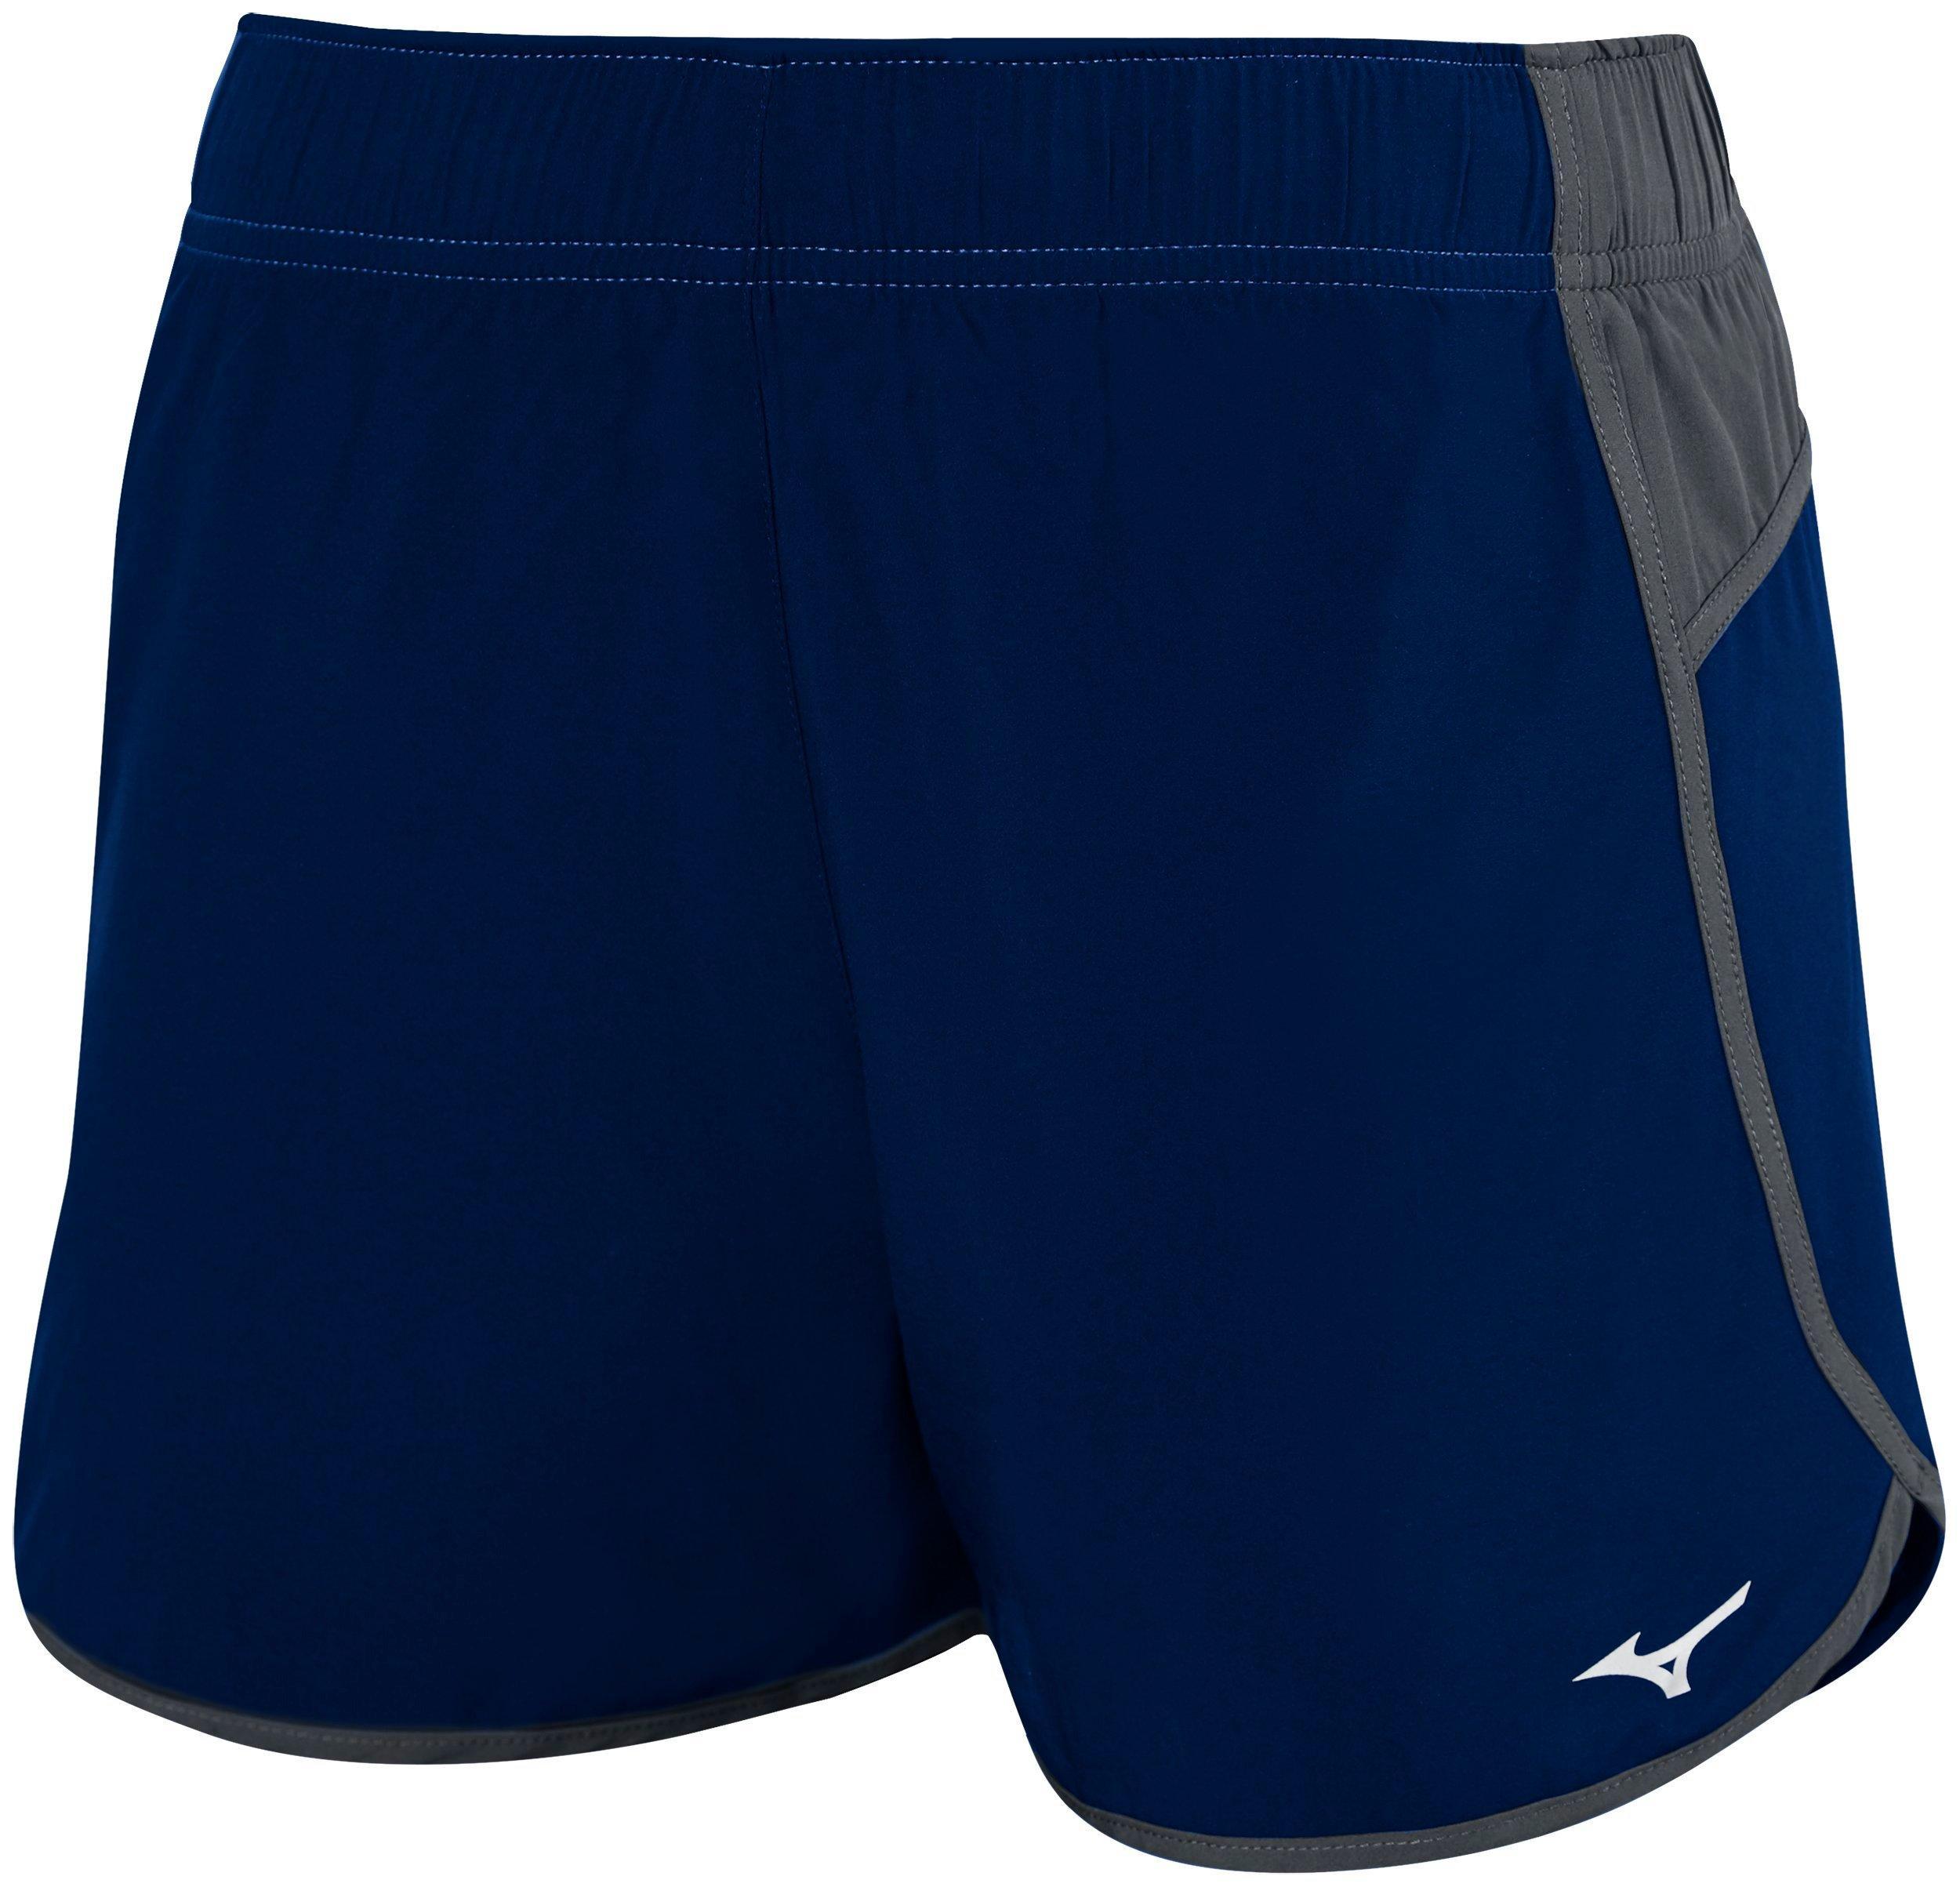 Mizuno Women's Atlanta Cover Up Volleyball Shorts, Size  In Color